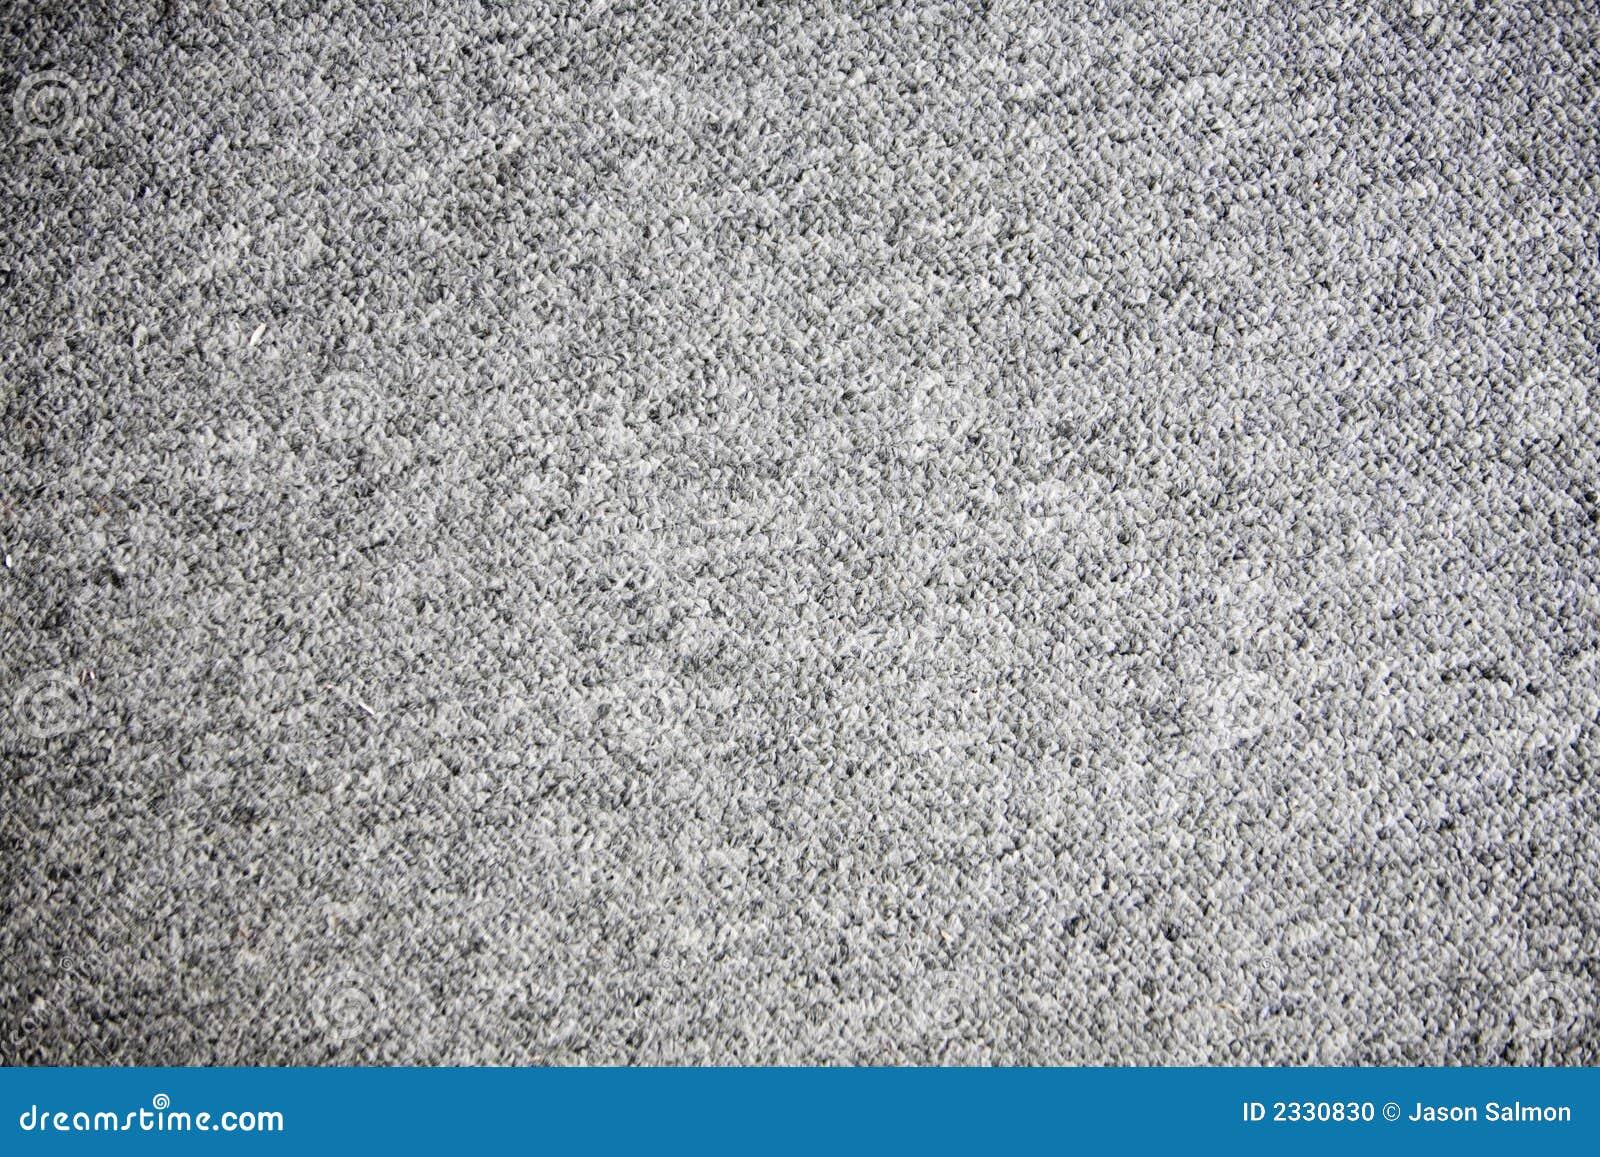 Gray Carpet Stock Photo Image 2330830